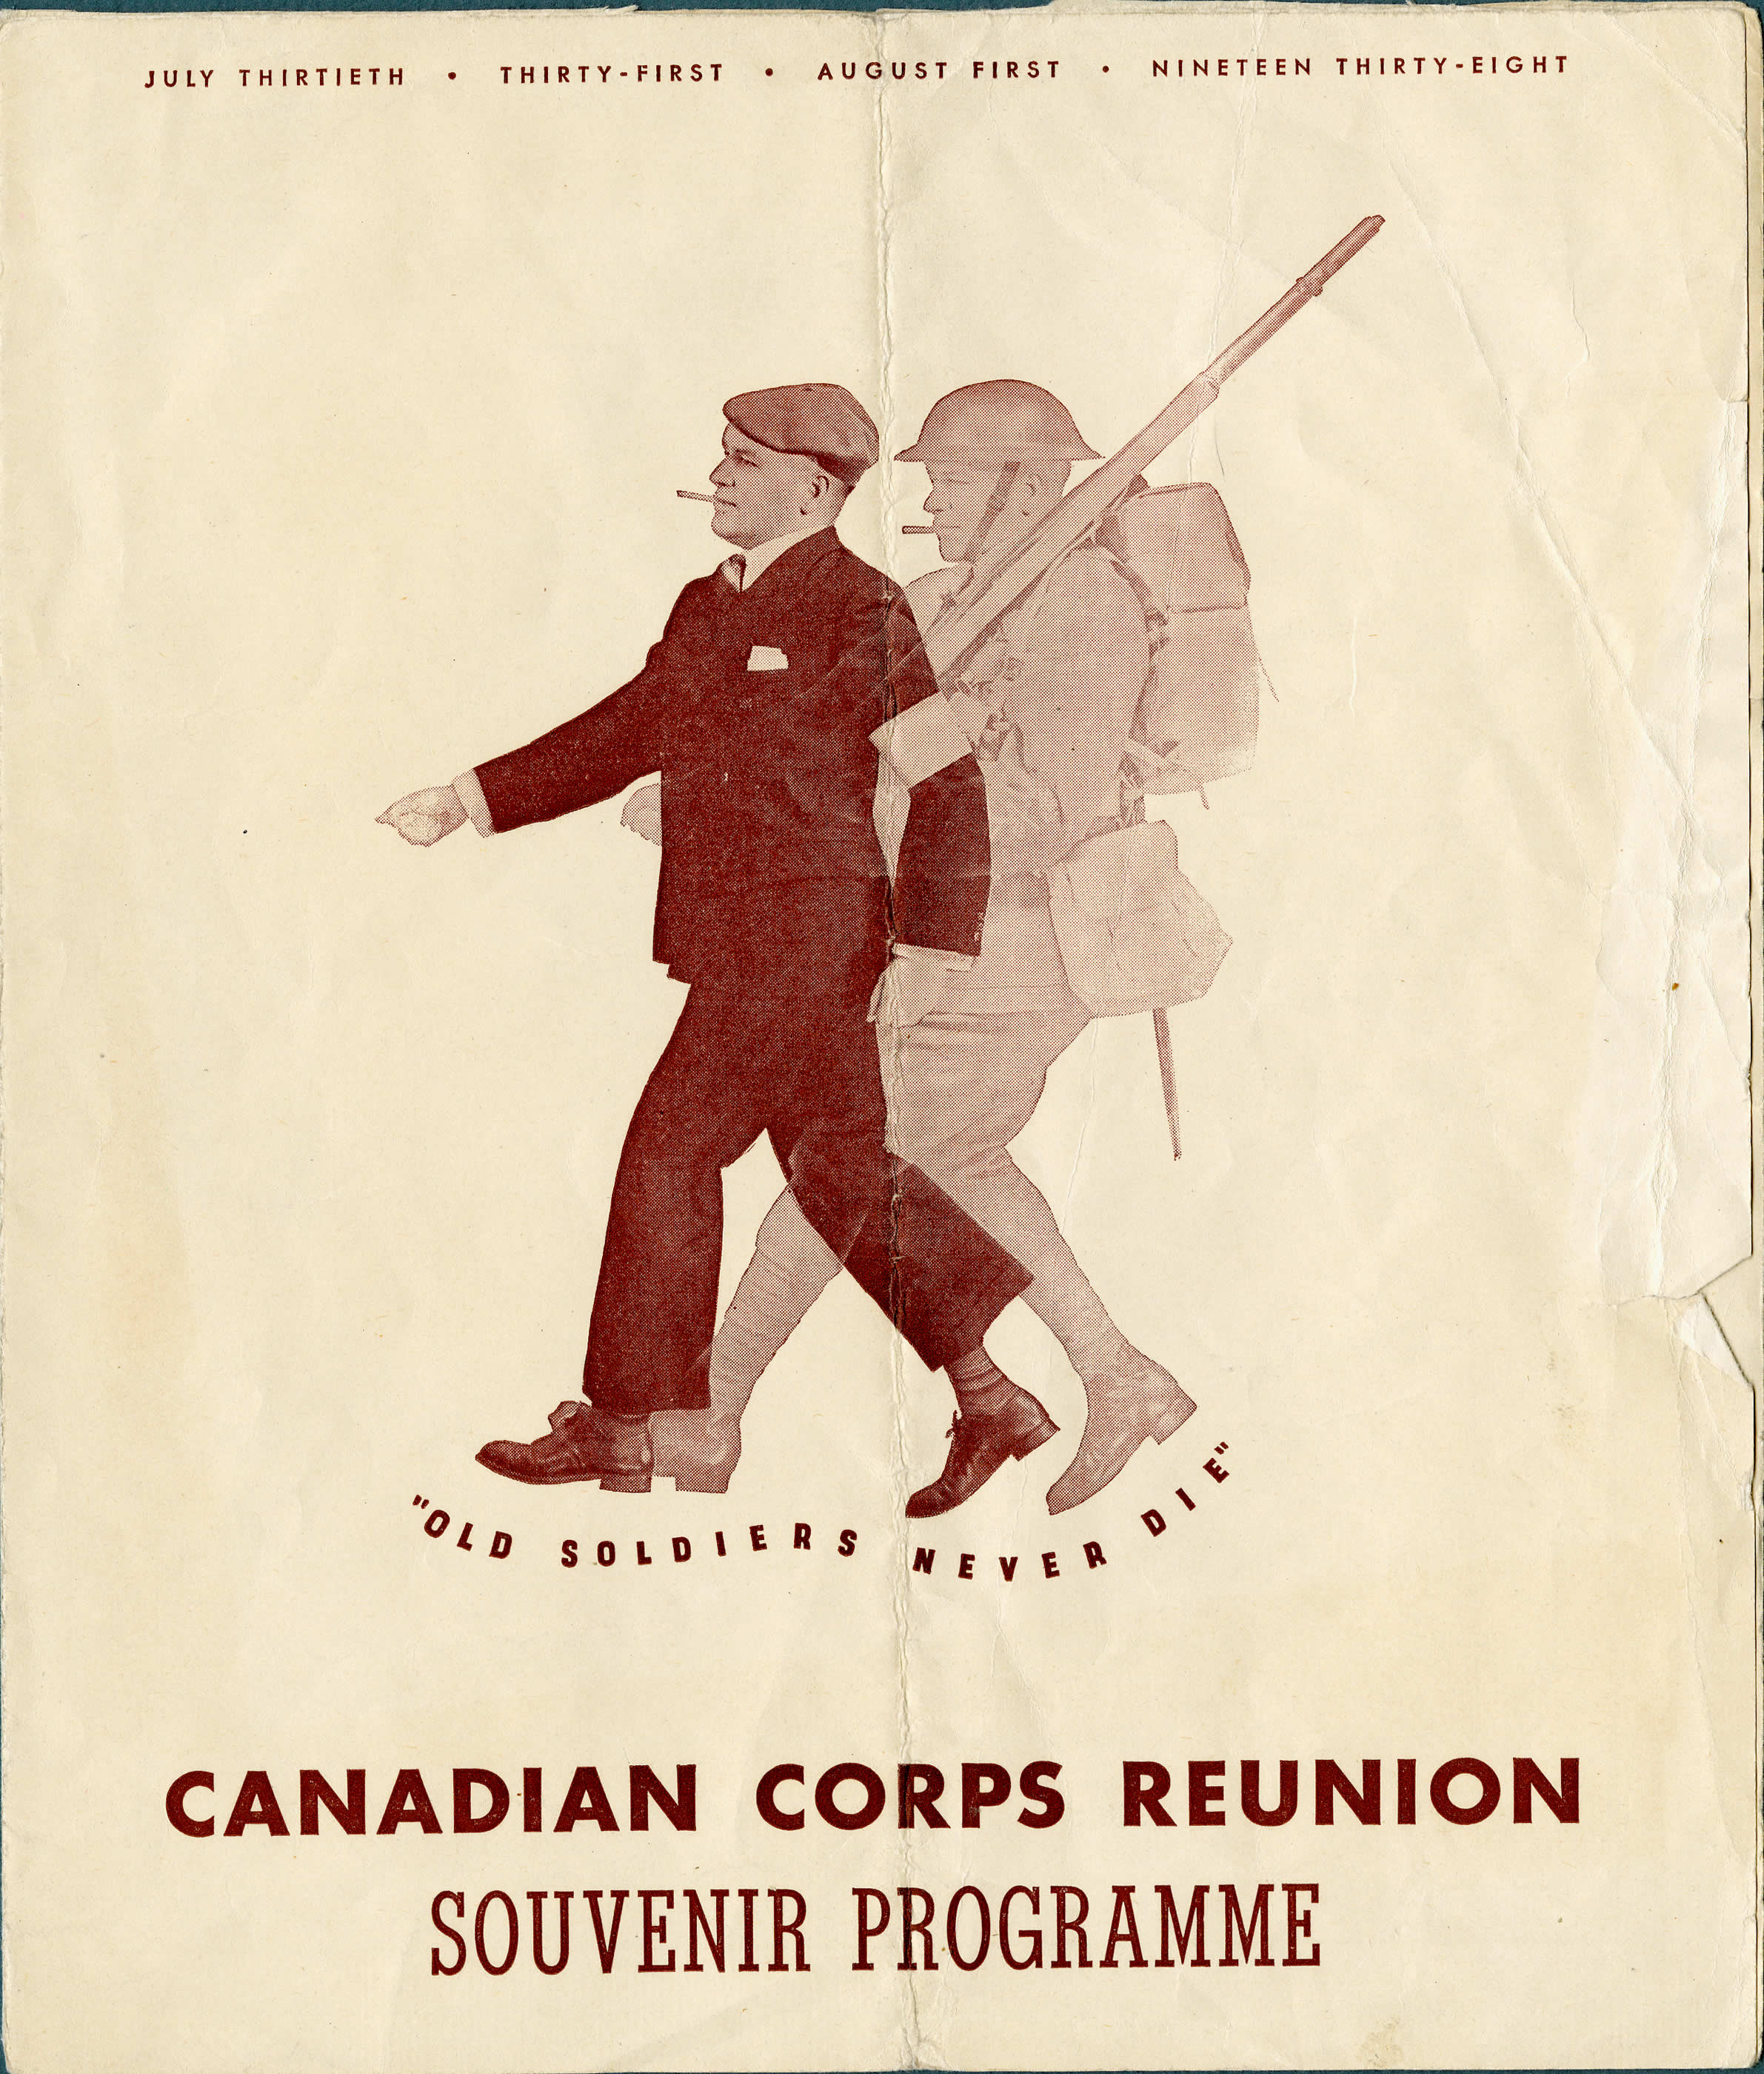 Canadian Corps Reunion